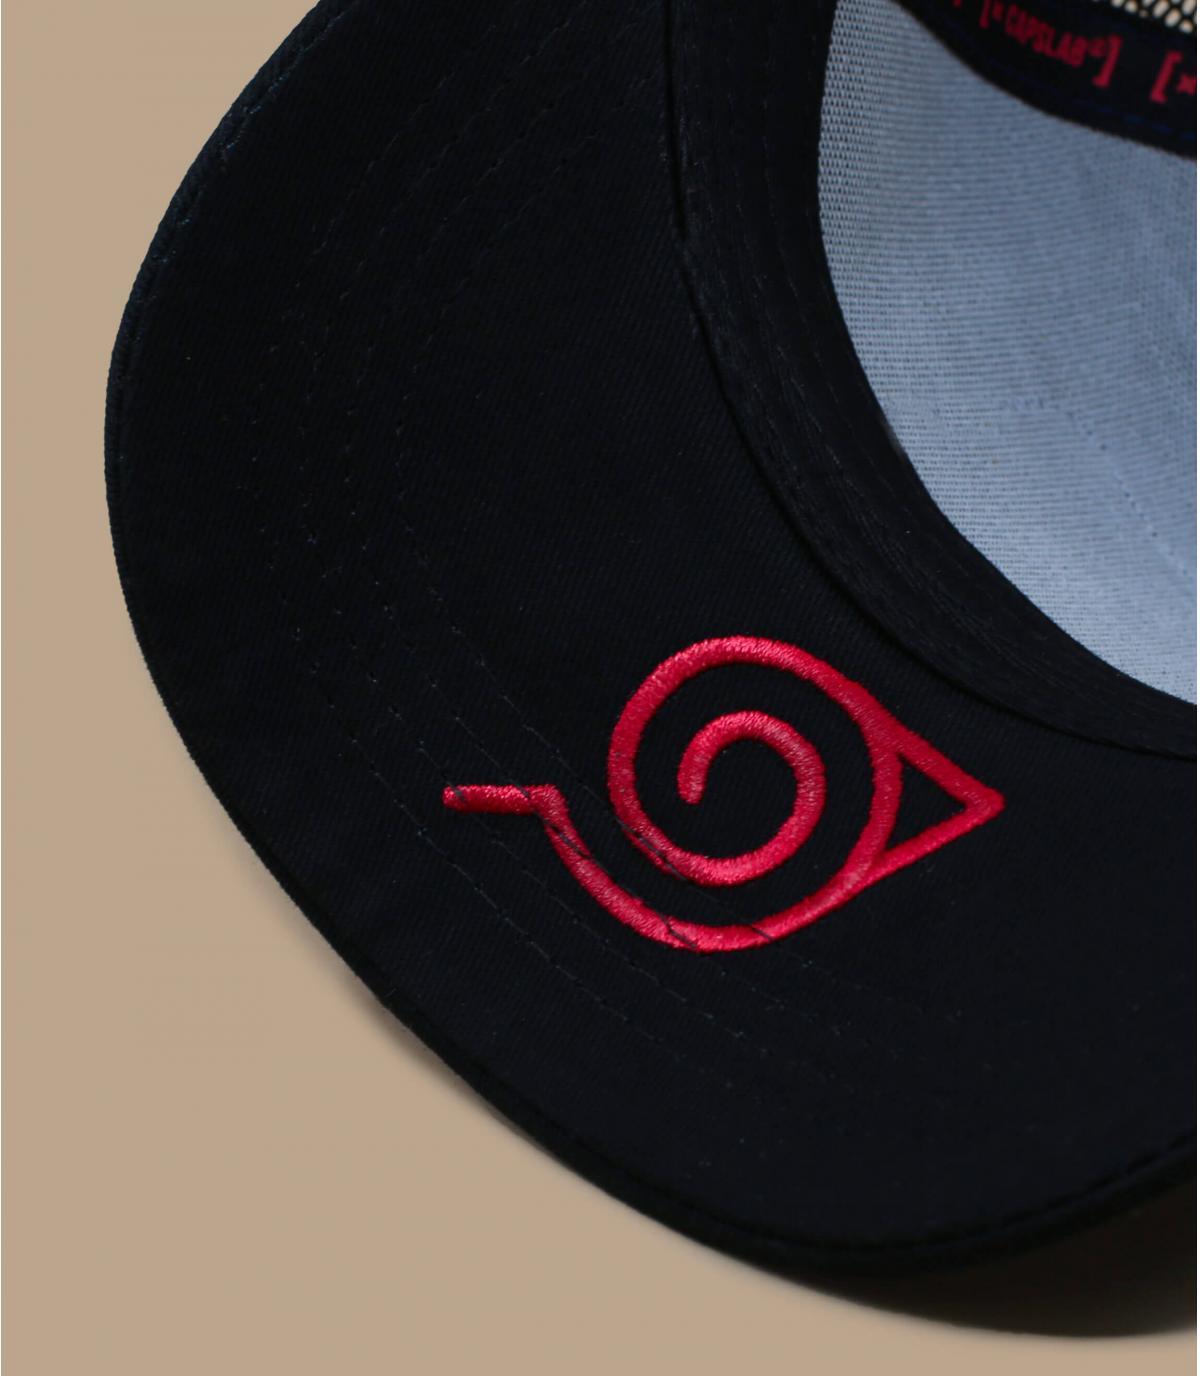 Details Trucker Naruto - afbeeling 5